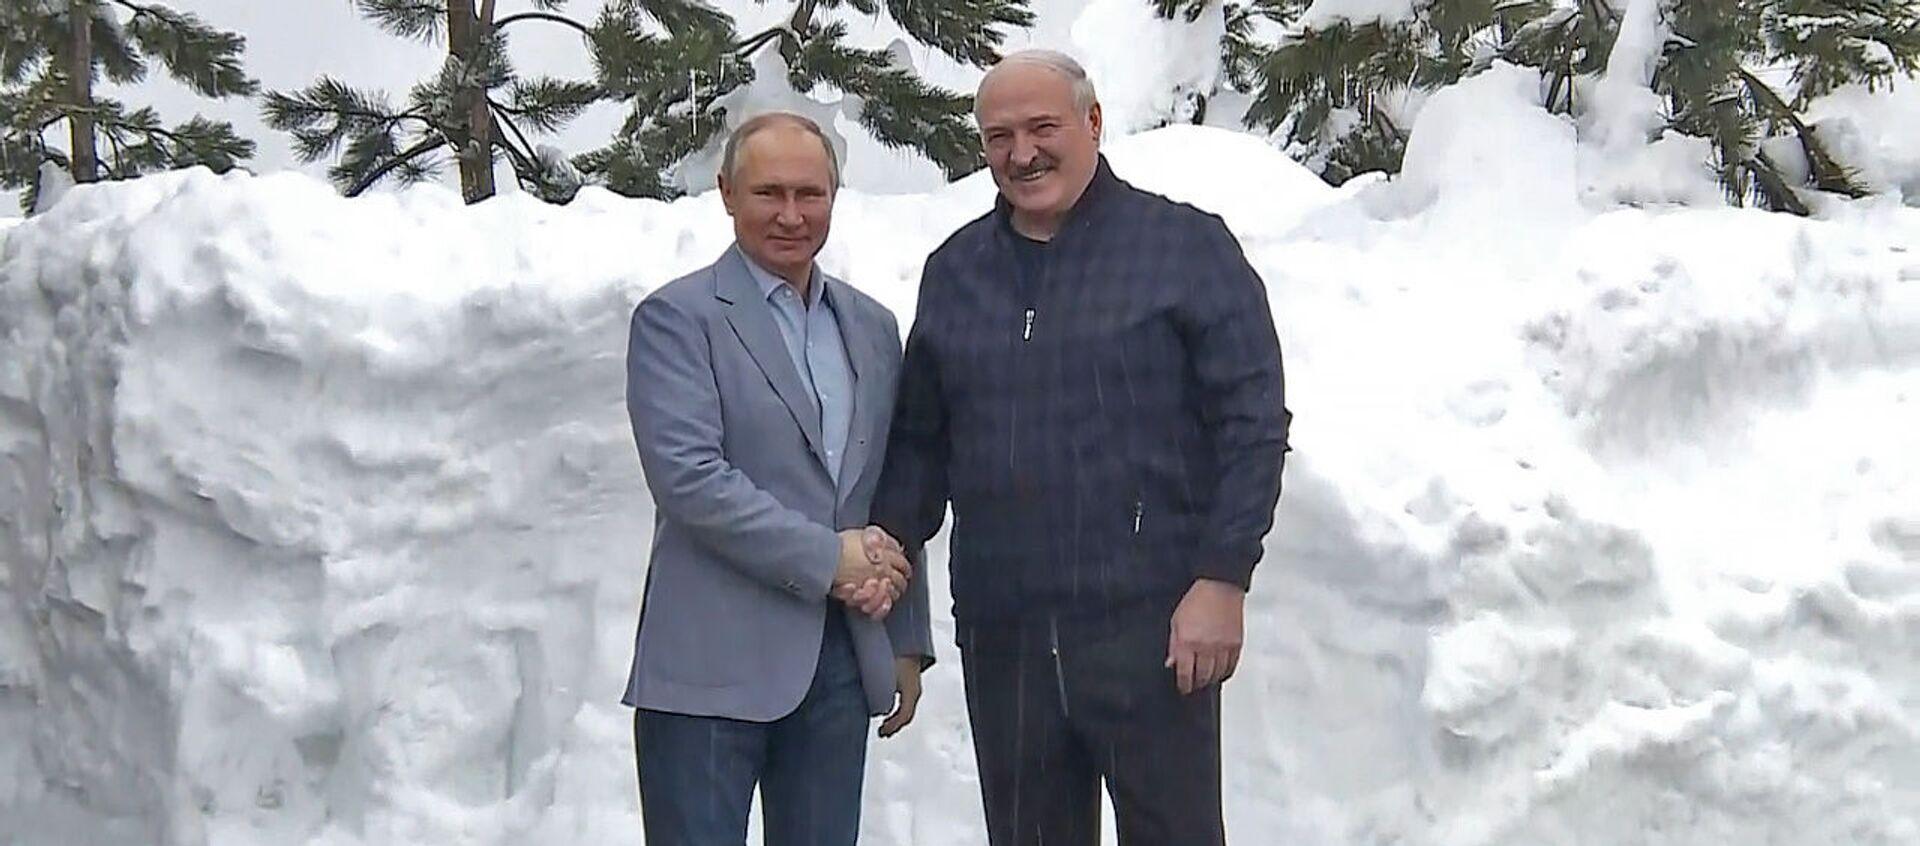 Лукашенко и Путин в Сочи без галстуков - видео - Sputnik Беларусь, 1920, 23.02.2021